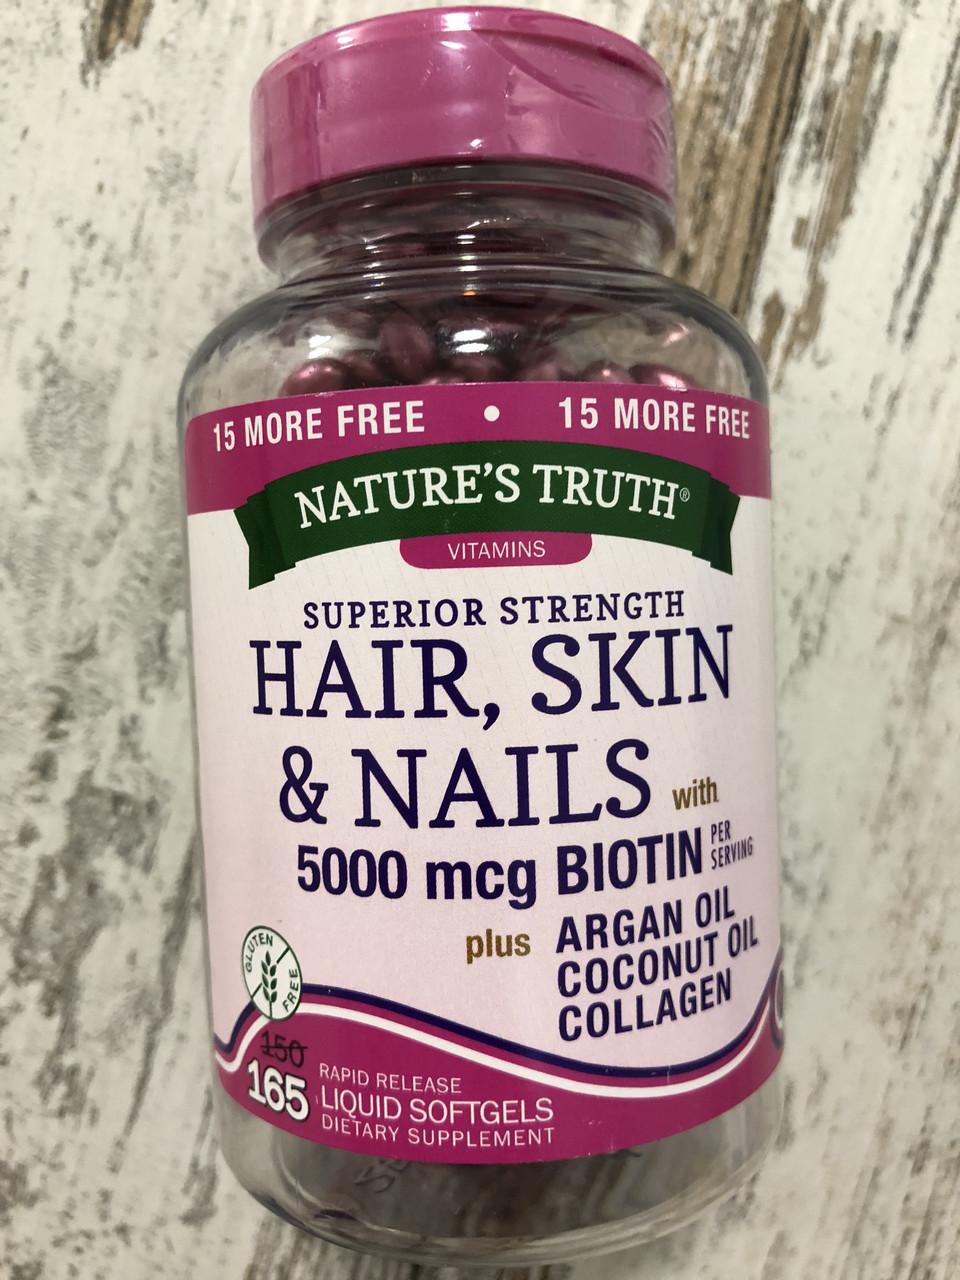 Витамины для волос, кожи и ногтей Nature's Truth Ultra Hair, Skin and Nails, 165 шт